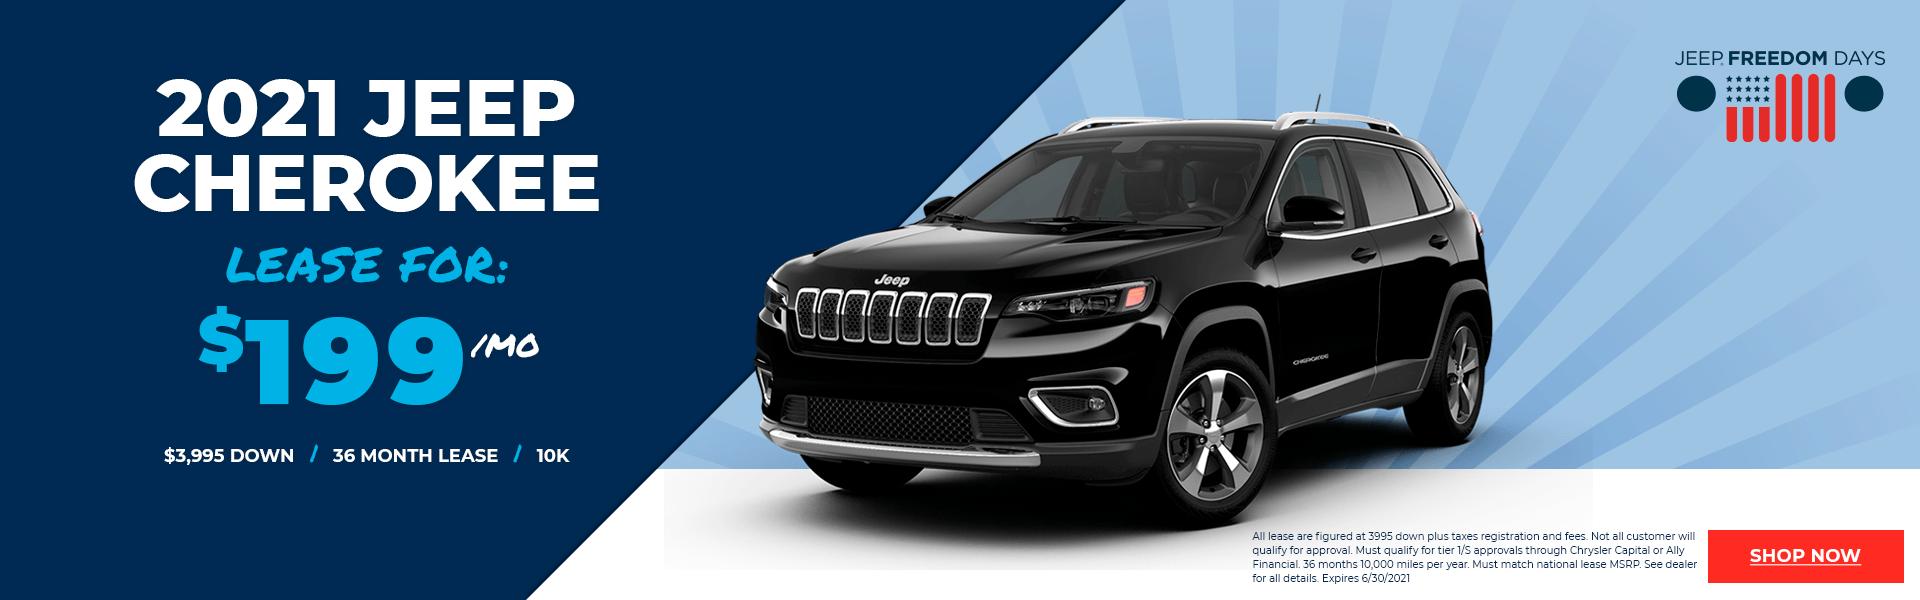 2021_New_Cherokee_Jeep_Freedom_Days_2